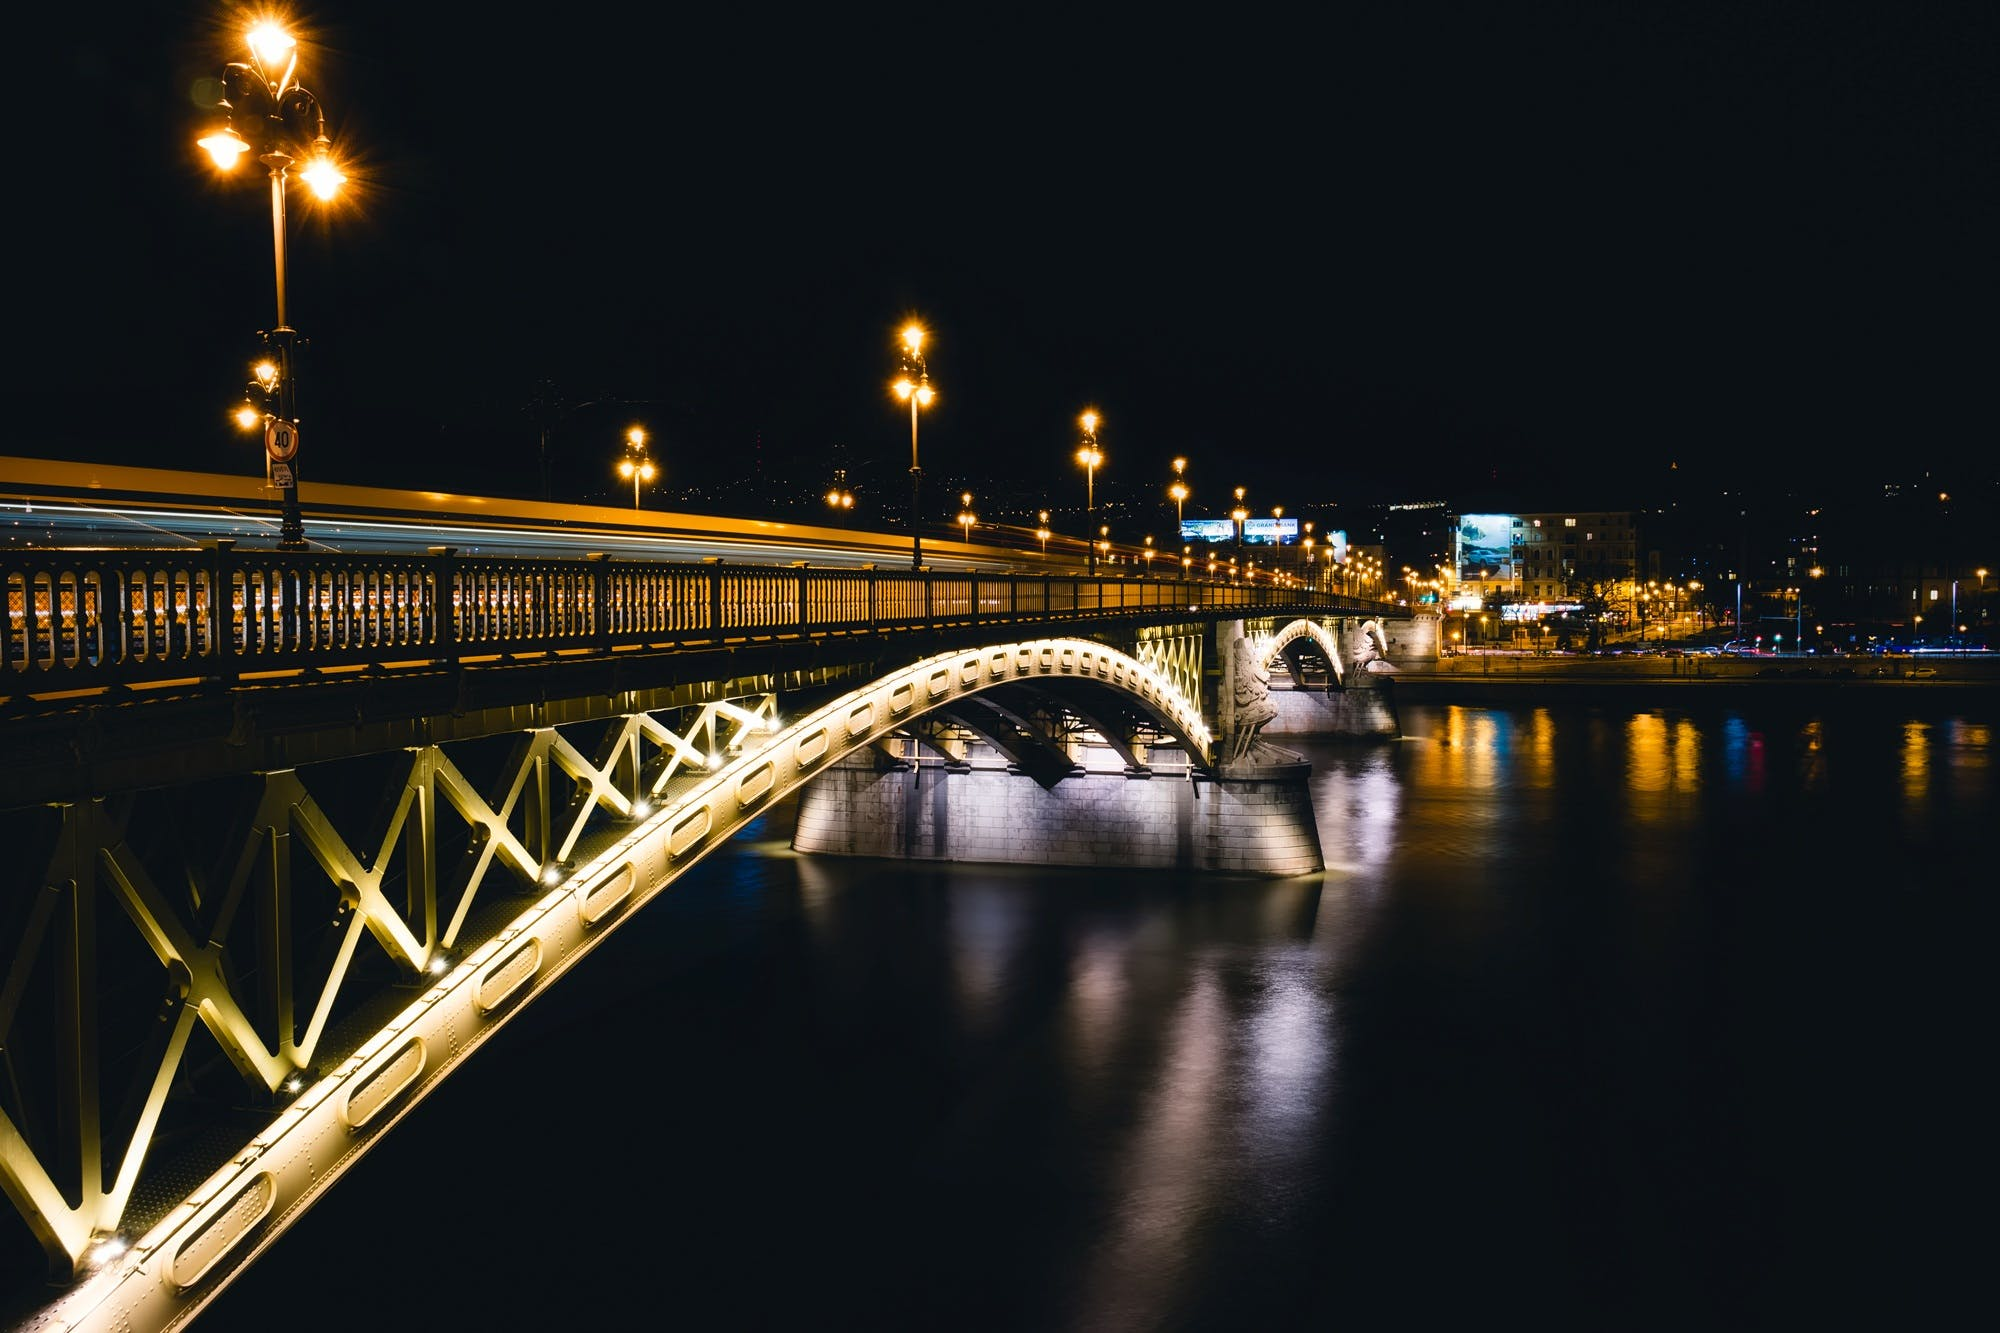 Gray Steel Bridge during Nighttime